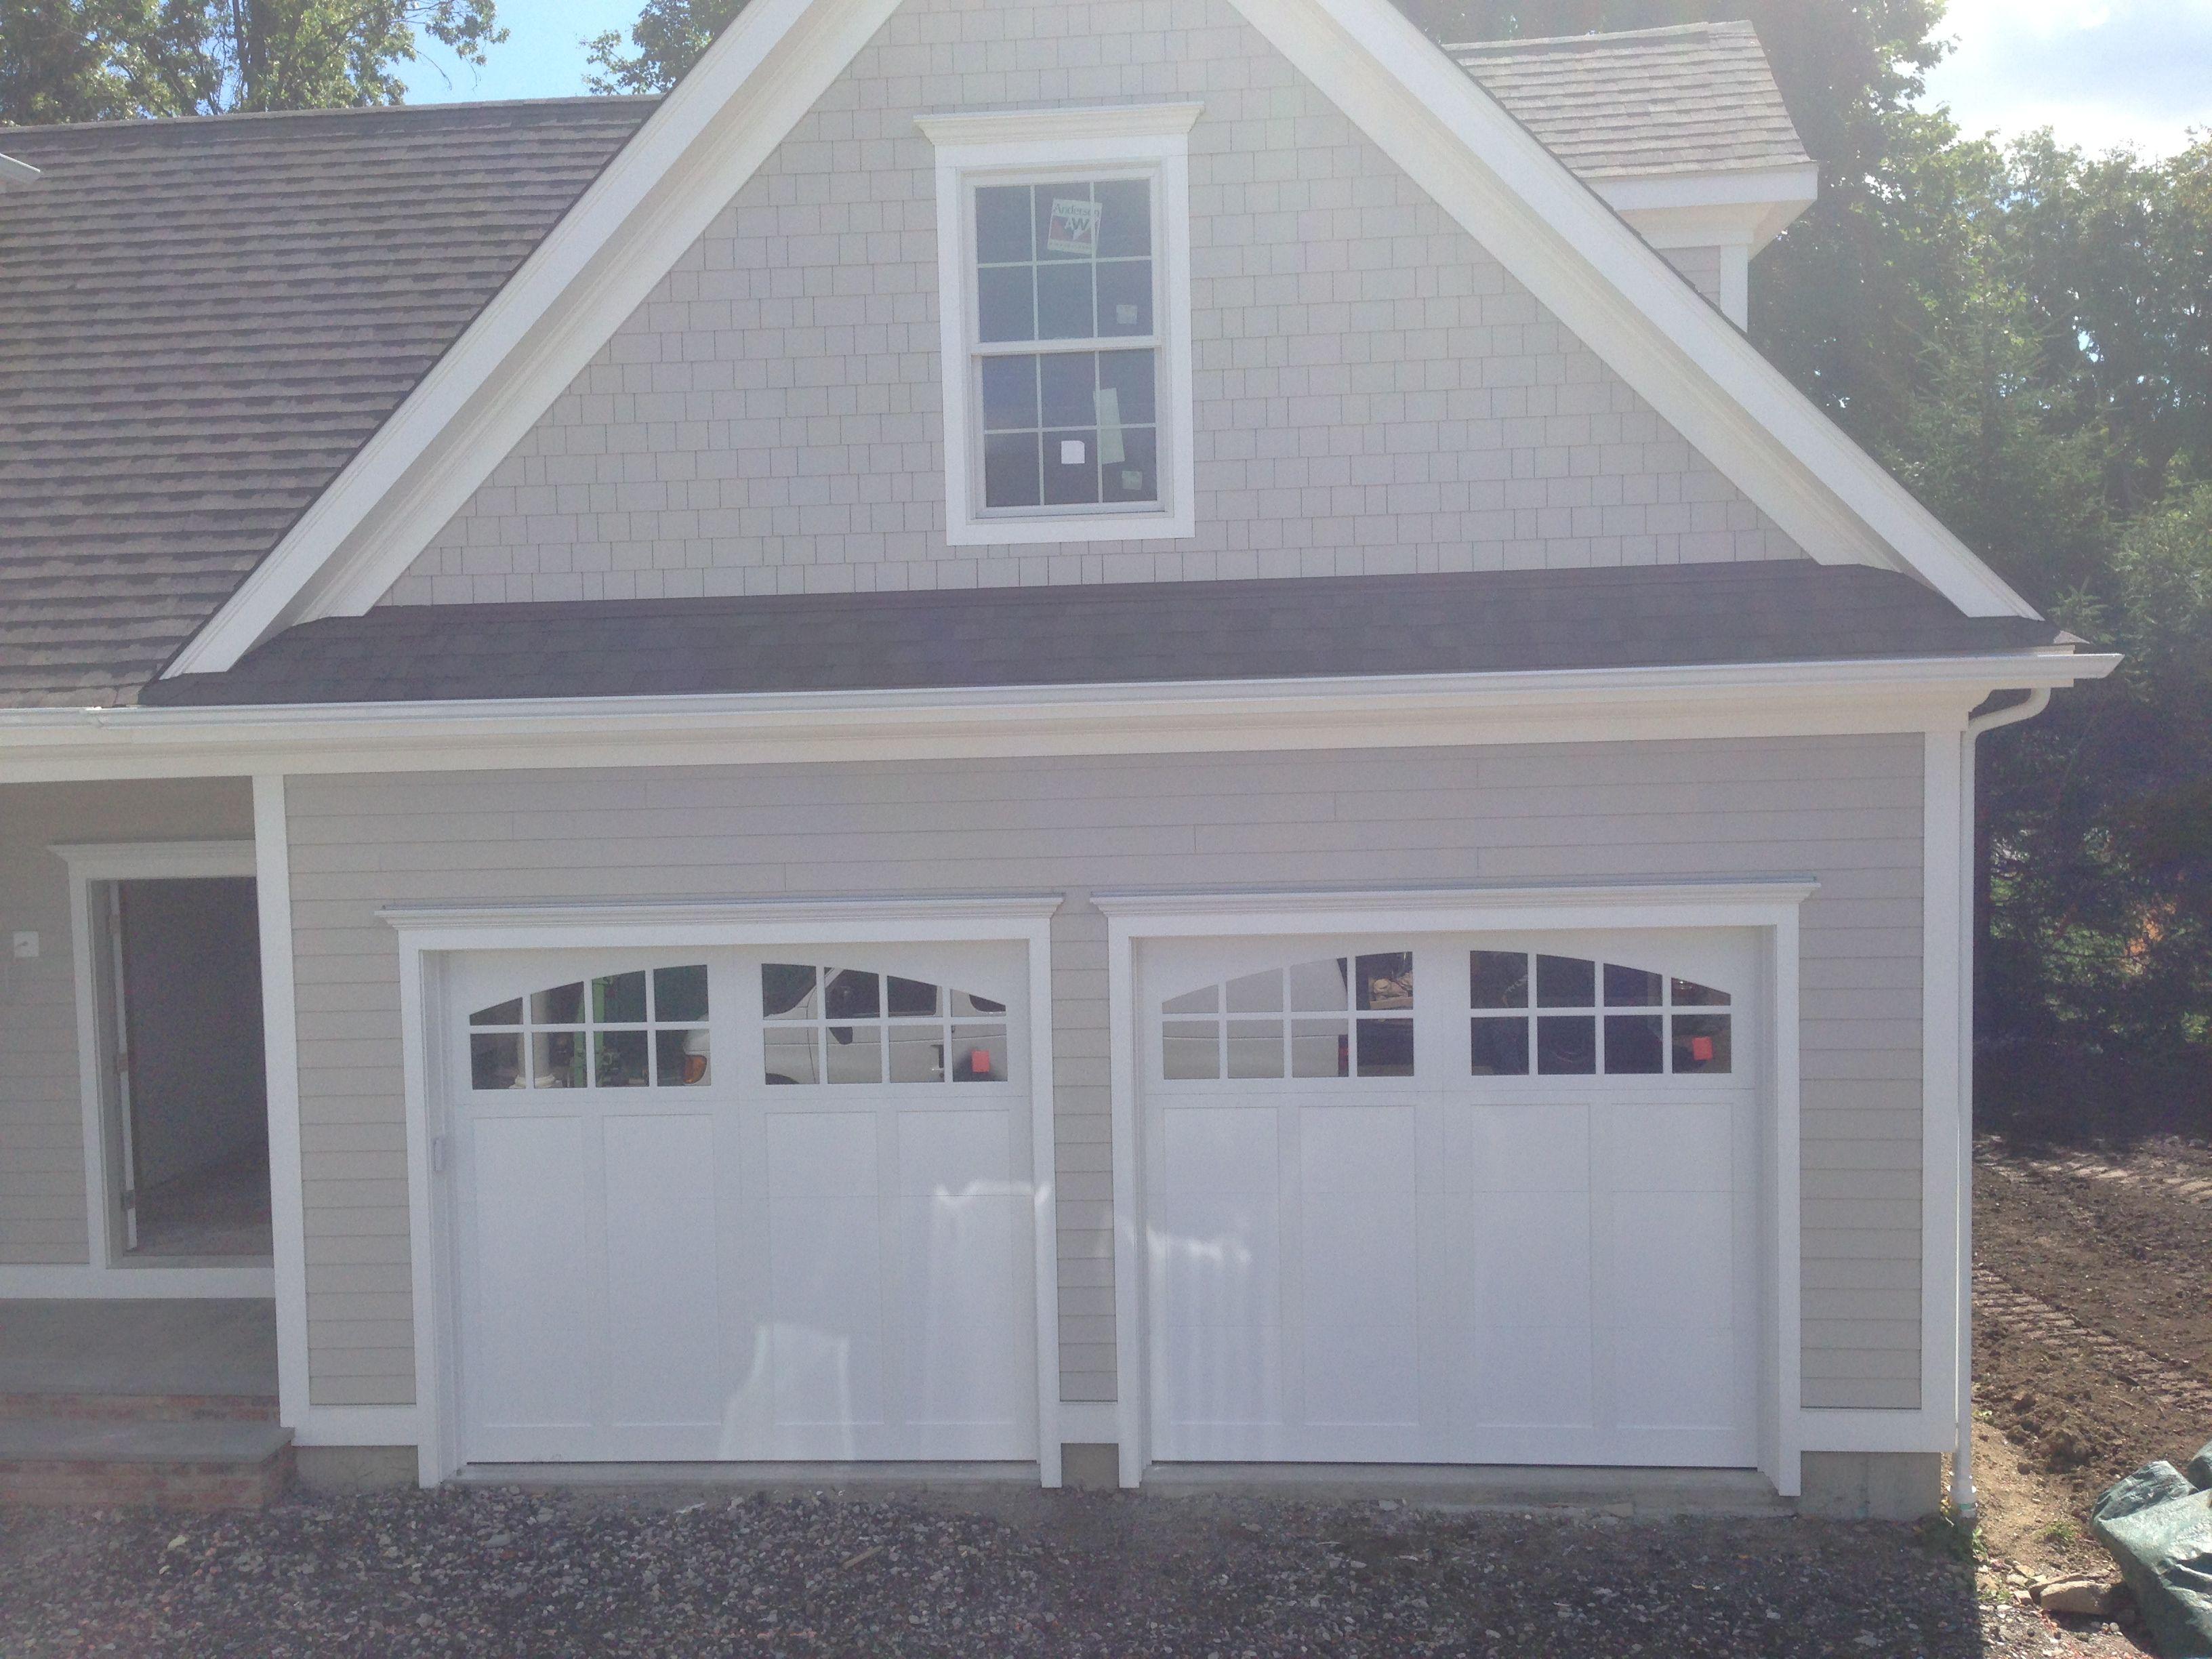 Fimbel LV12 Ford & Fimbel LV12 Ford | Insulated Steel Doors | Pinterest | Steel doors ... pezcame.com